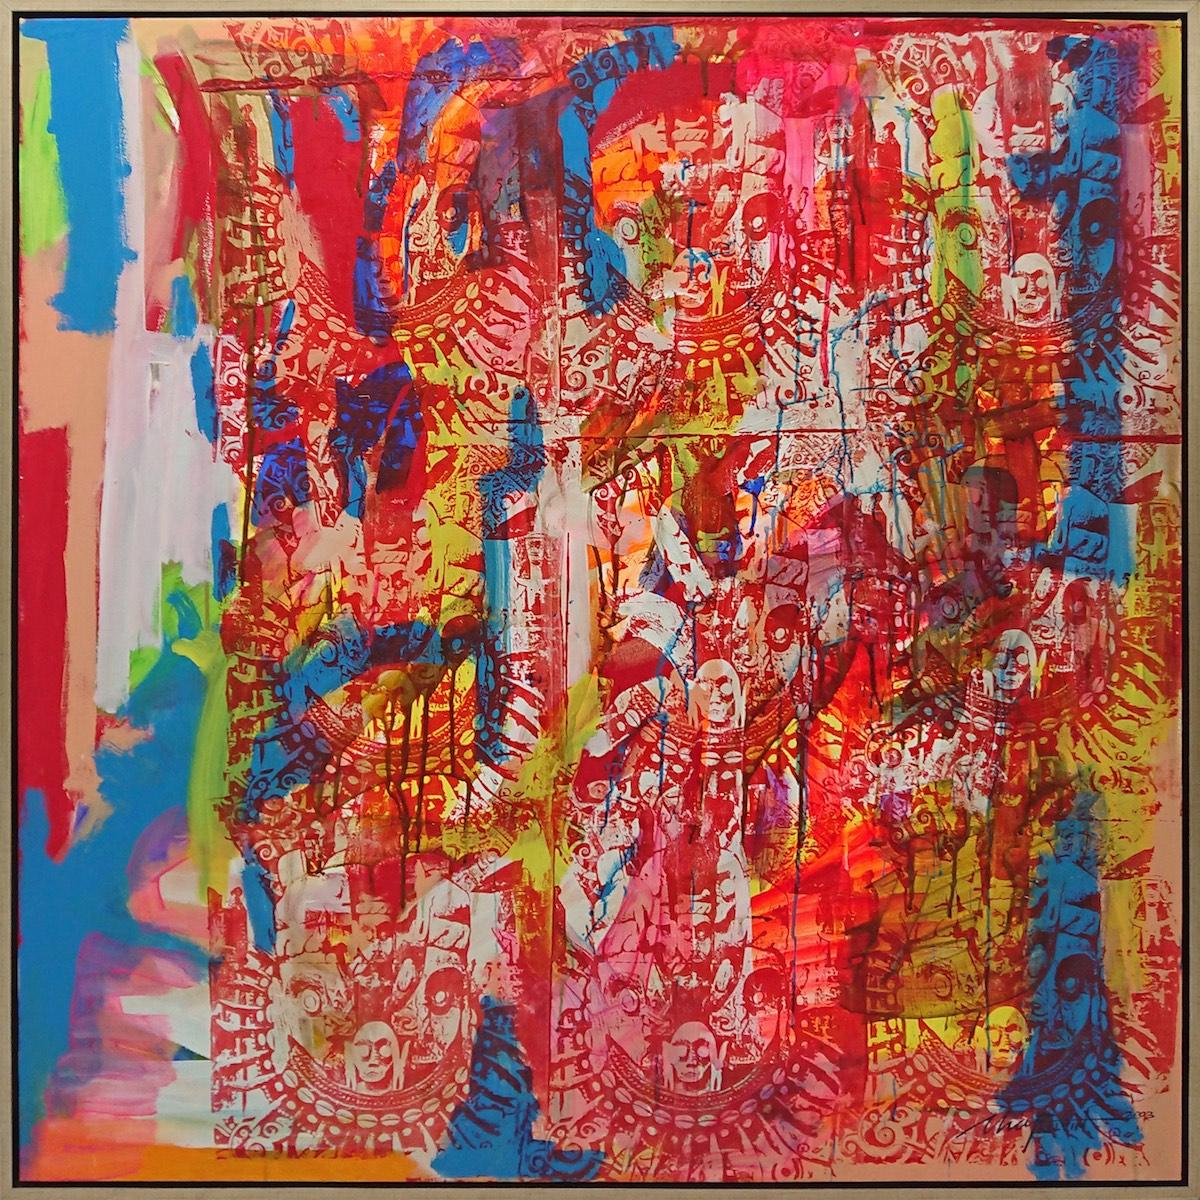 Red Zone, 2003 by Kelvin Chap